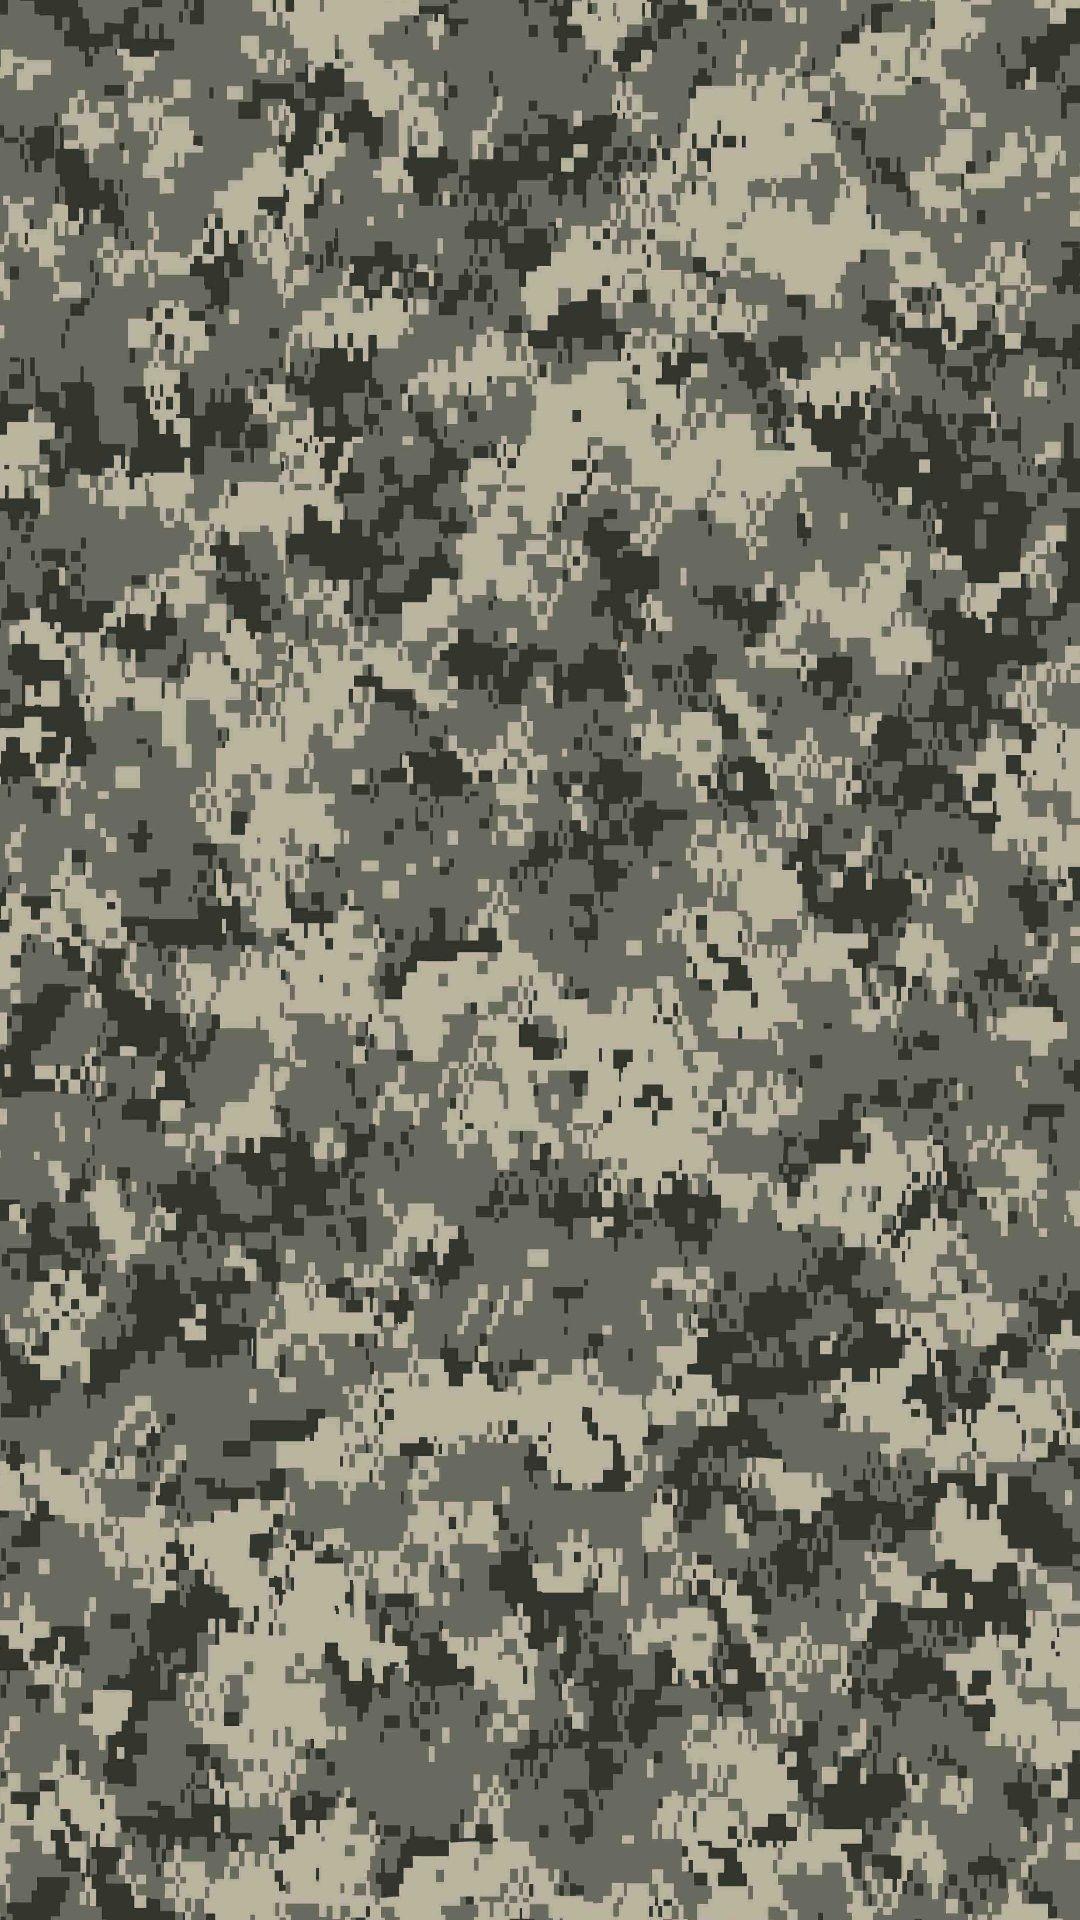 Desert Camo Wallpapers - Wallpaper Cave